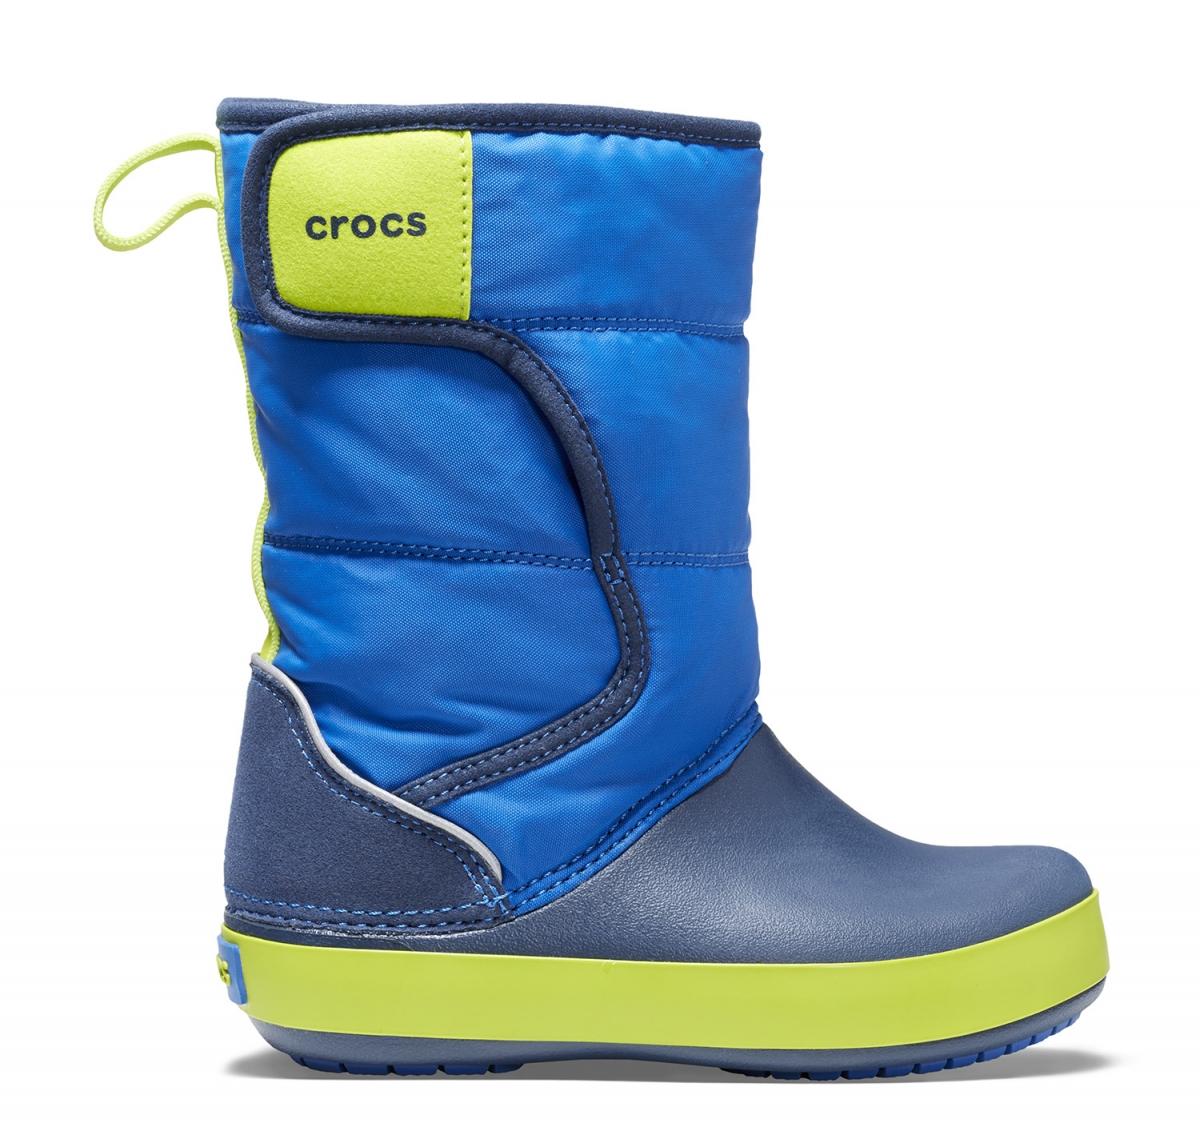 Crocs LodgePoint Snow Boot Kids - Blue Jean/Navy, J3 (34-35)